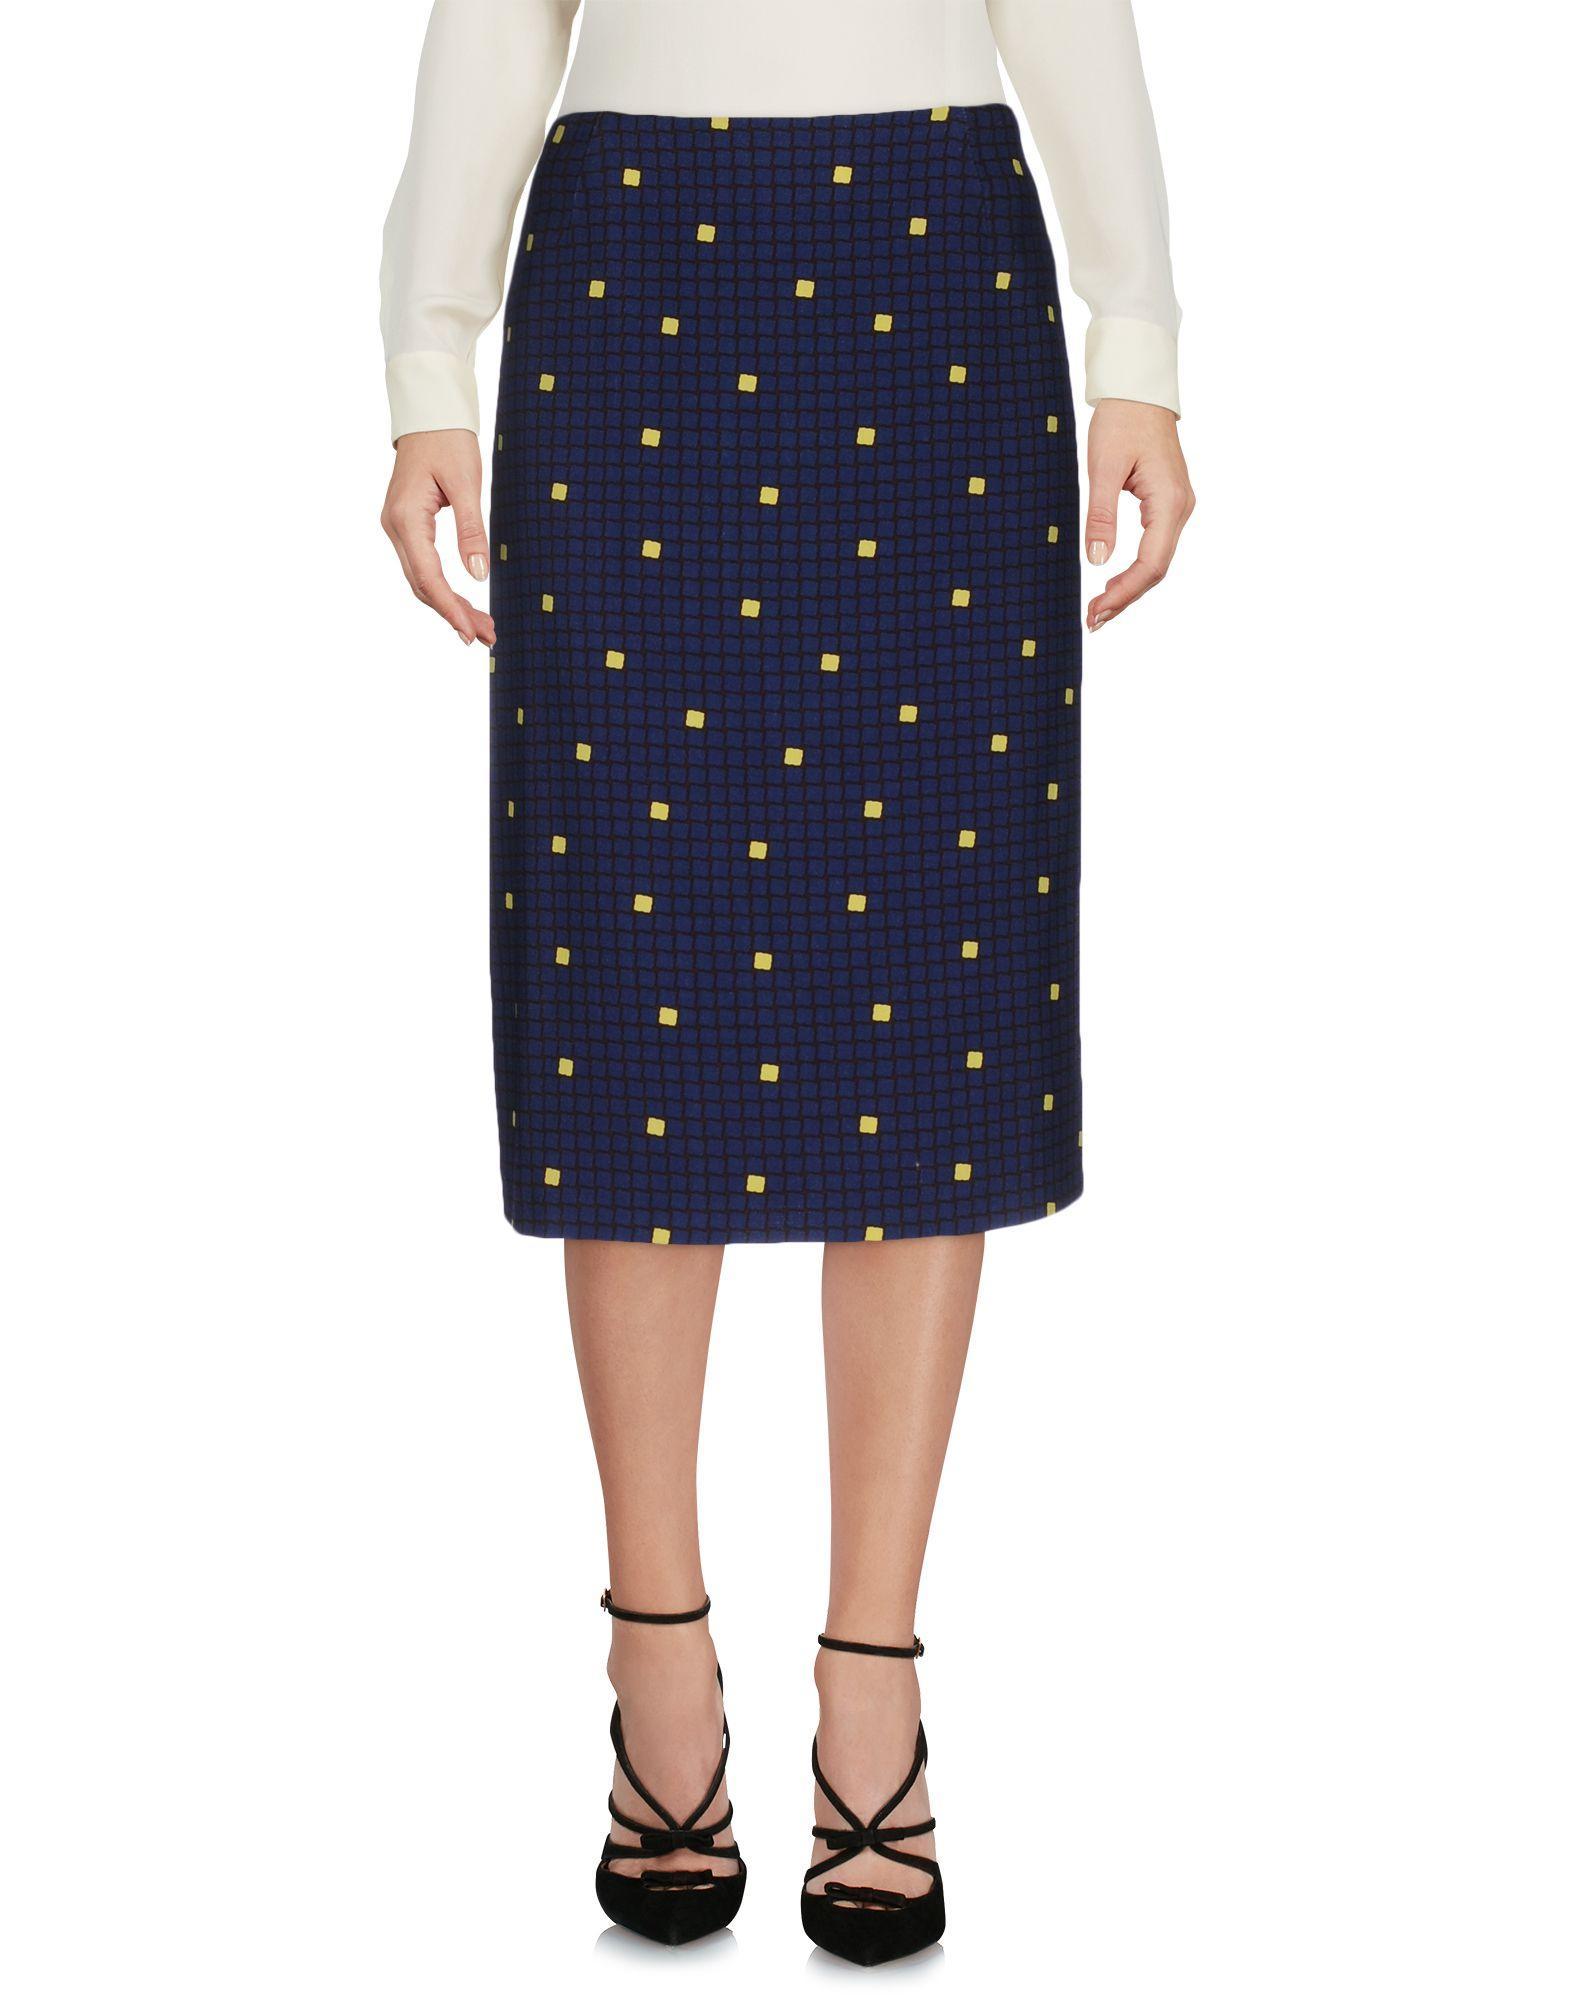 LAURA URBINATI Midi Skirts in Dark Blue